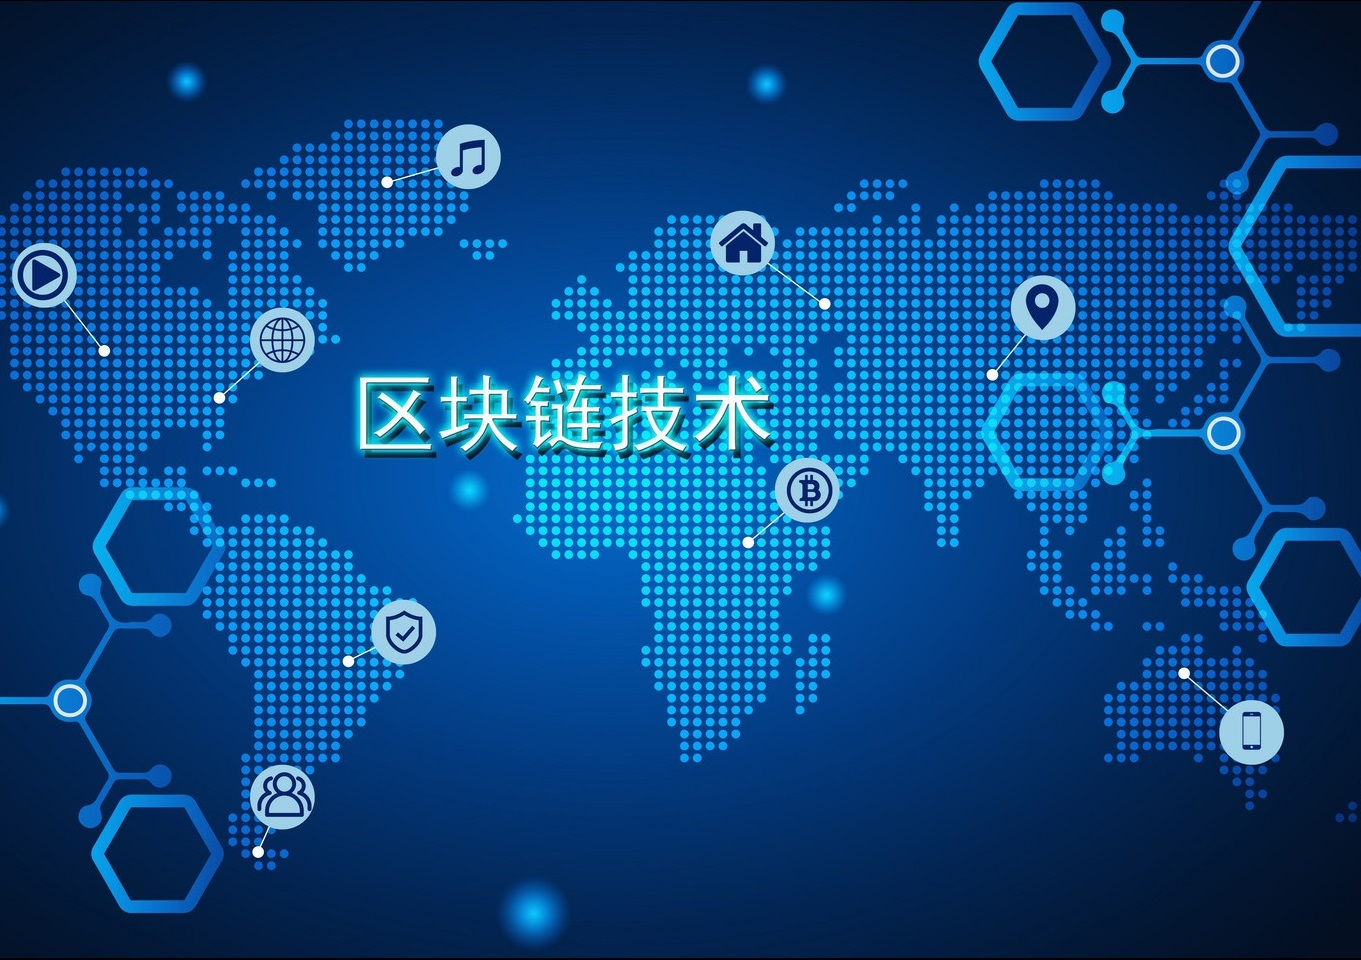 NTT DATA 區塊鏈技術| www.nttdata.com.cn